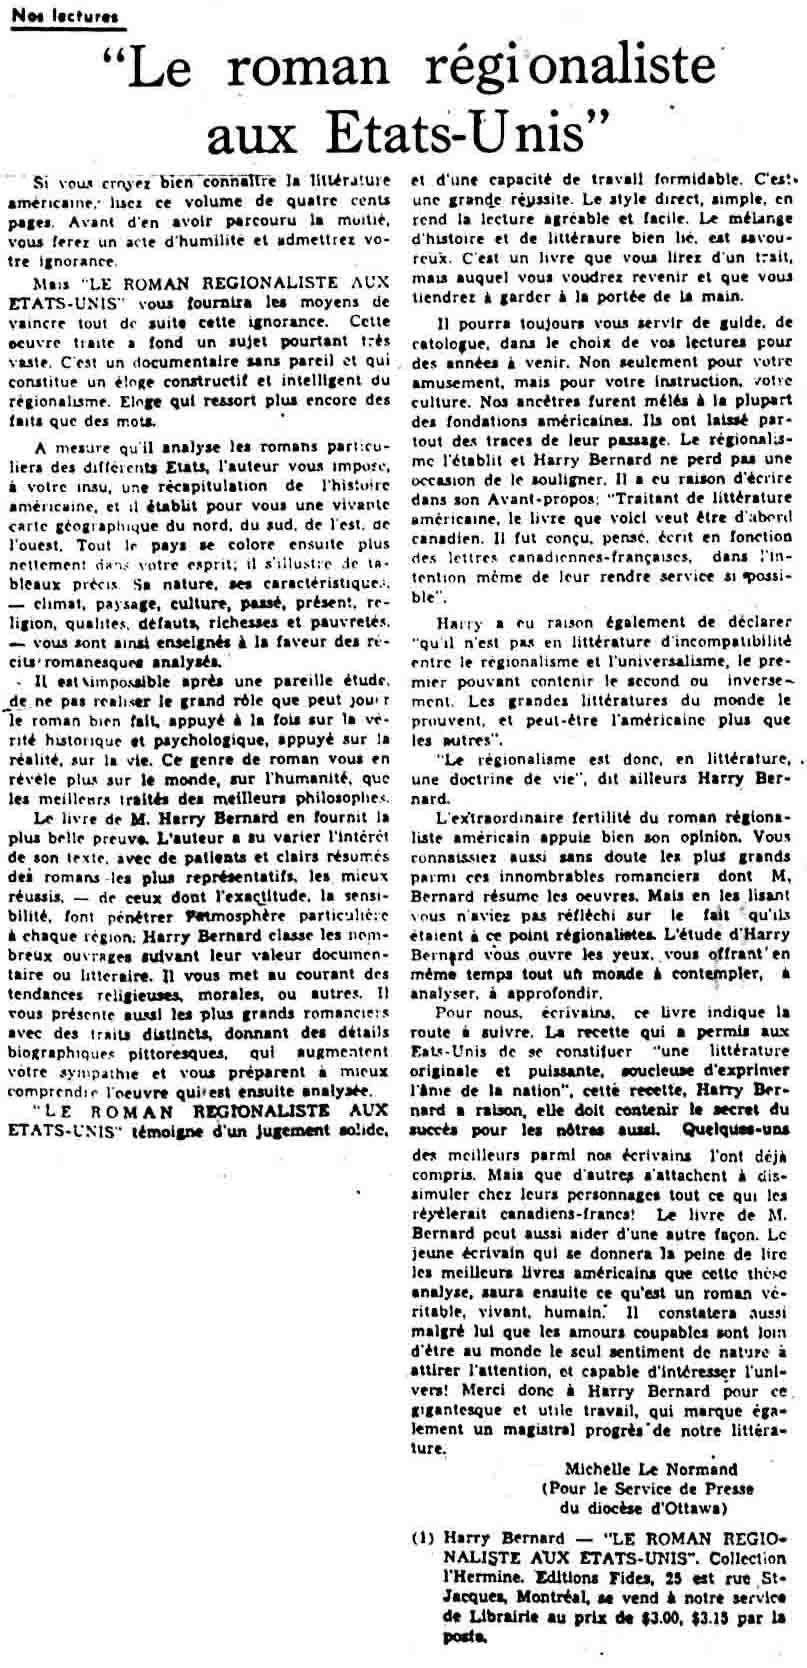 24 avril 1950